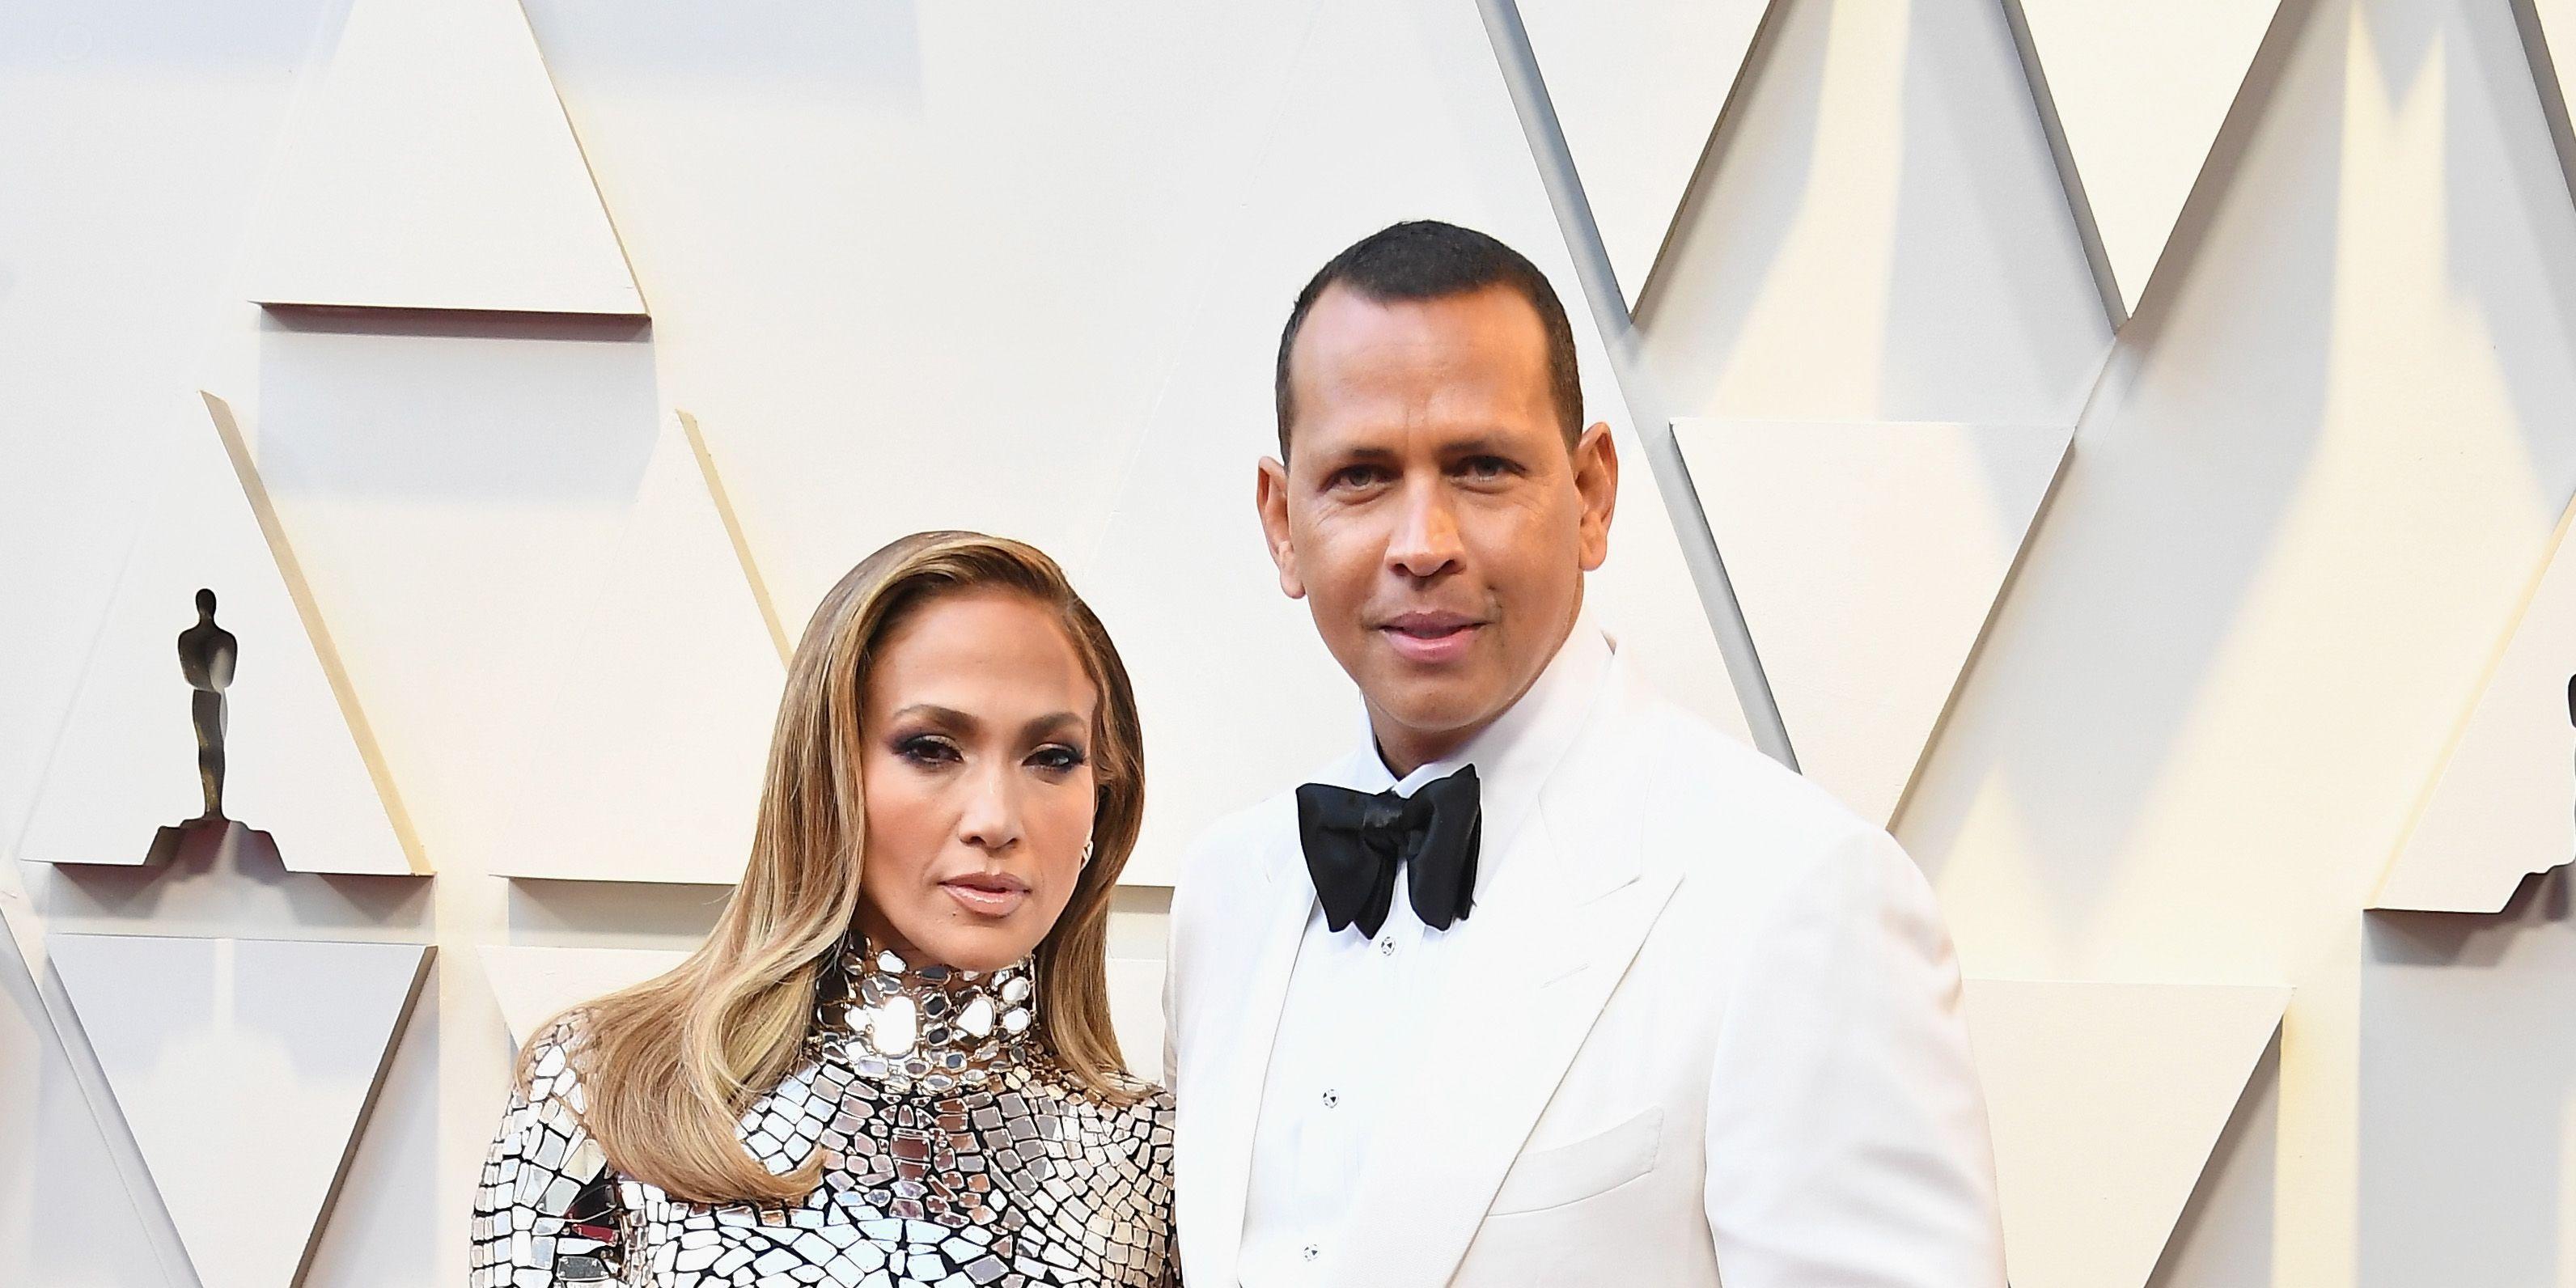 Jennifer Lopez and Alex Rodriguez at the Oscars 2019